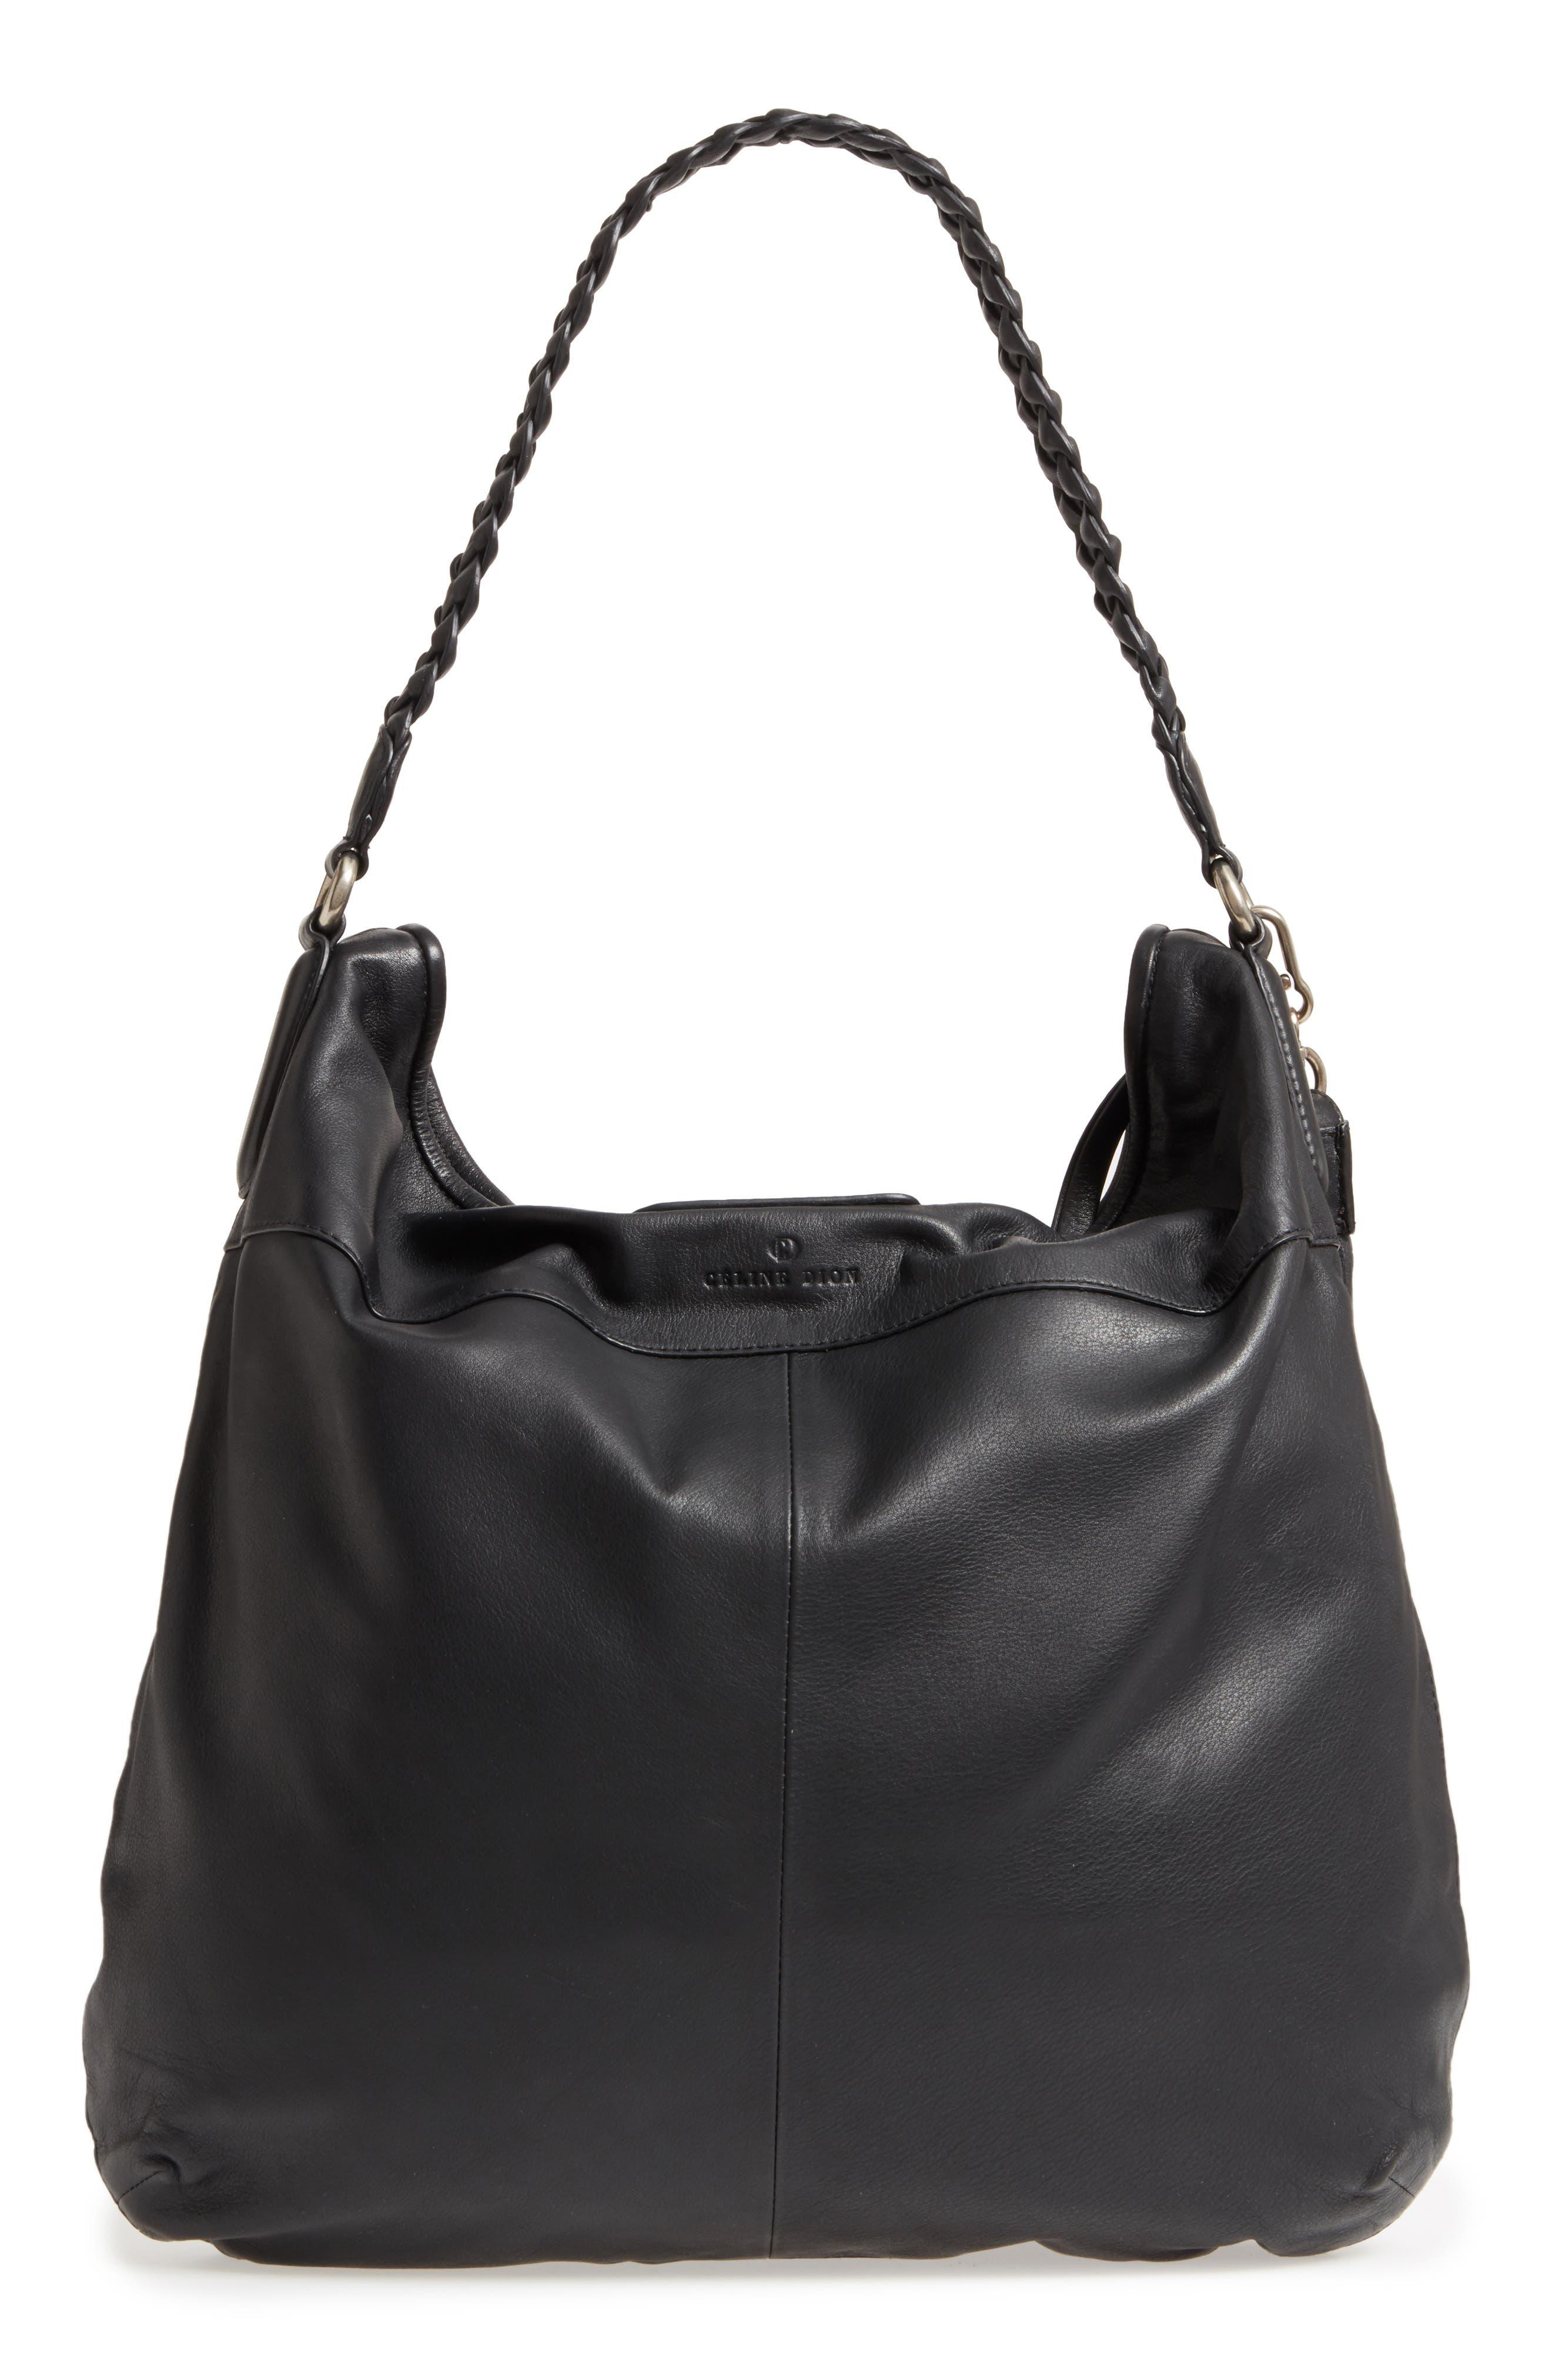 Céline Dion Cadence Leather Hobo Bag,                             Alternate thumbnail 3, color,                             001